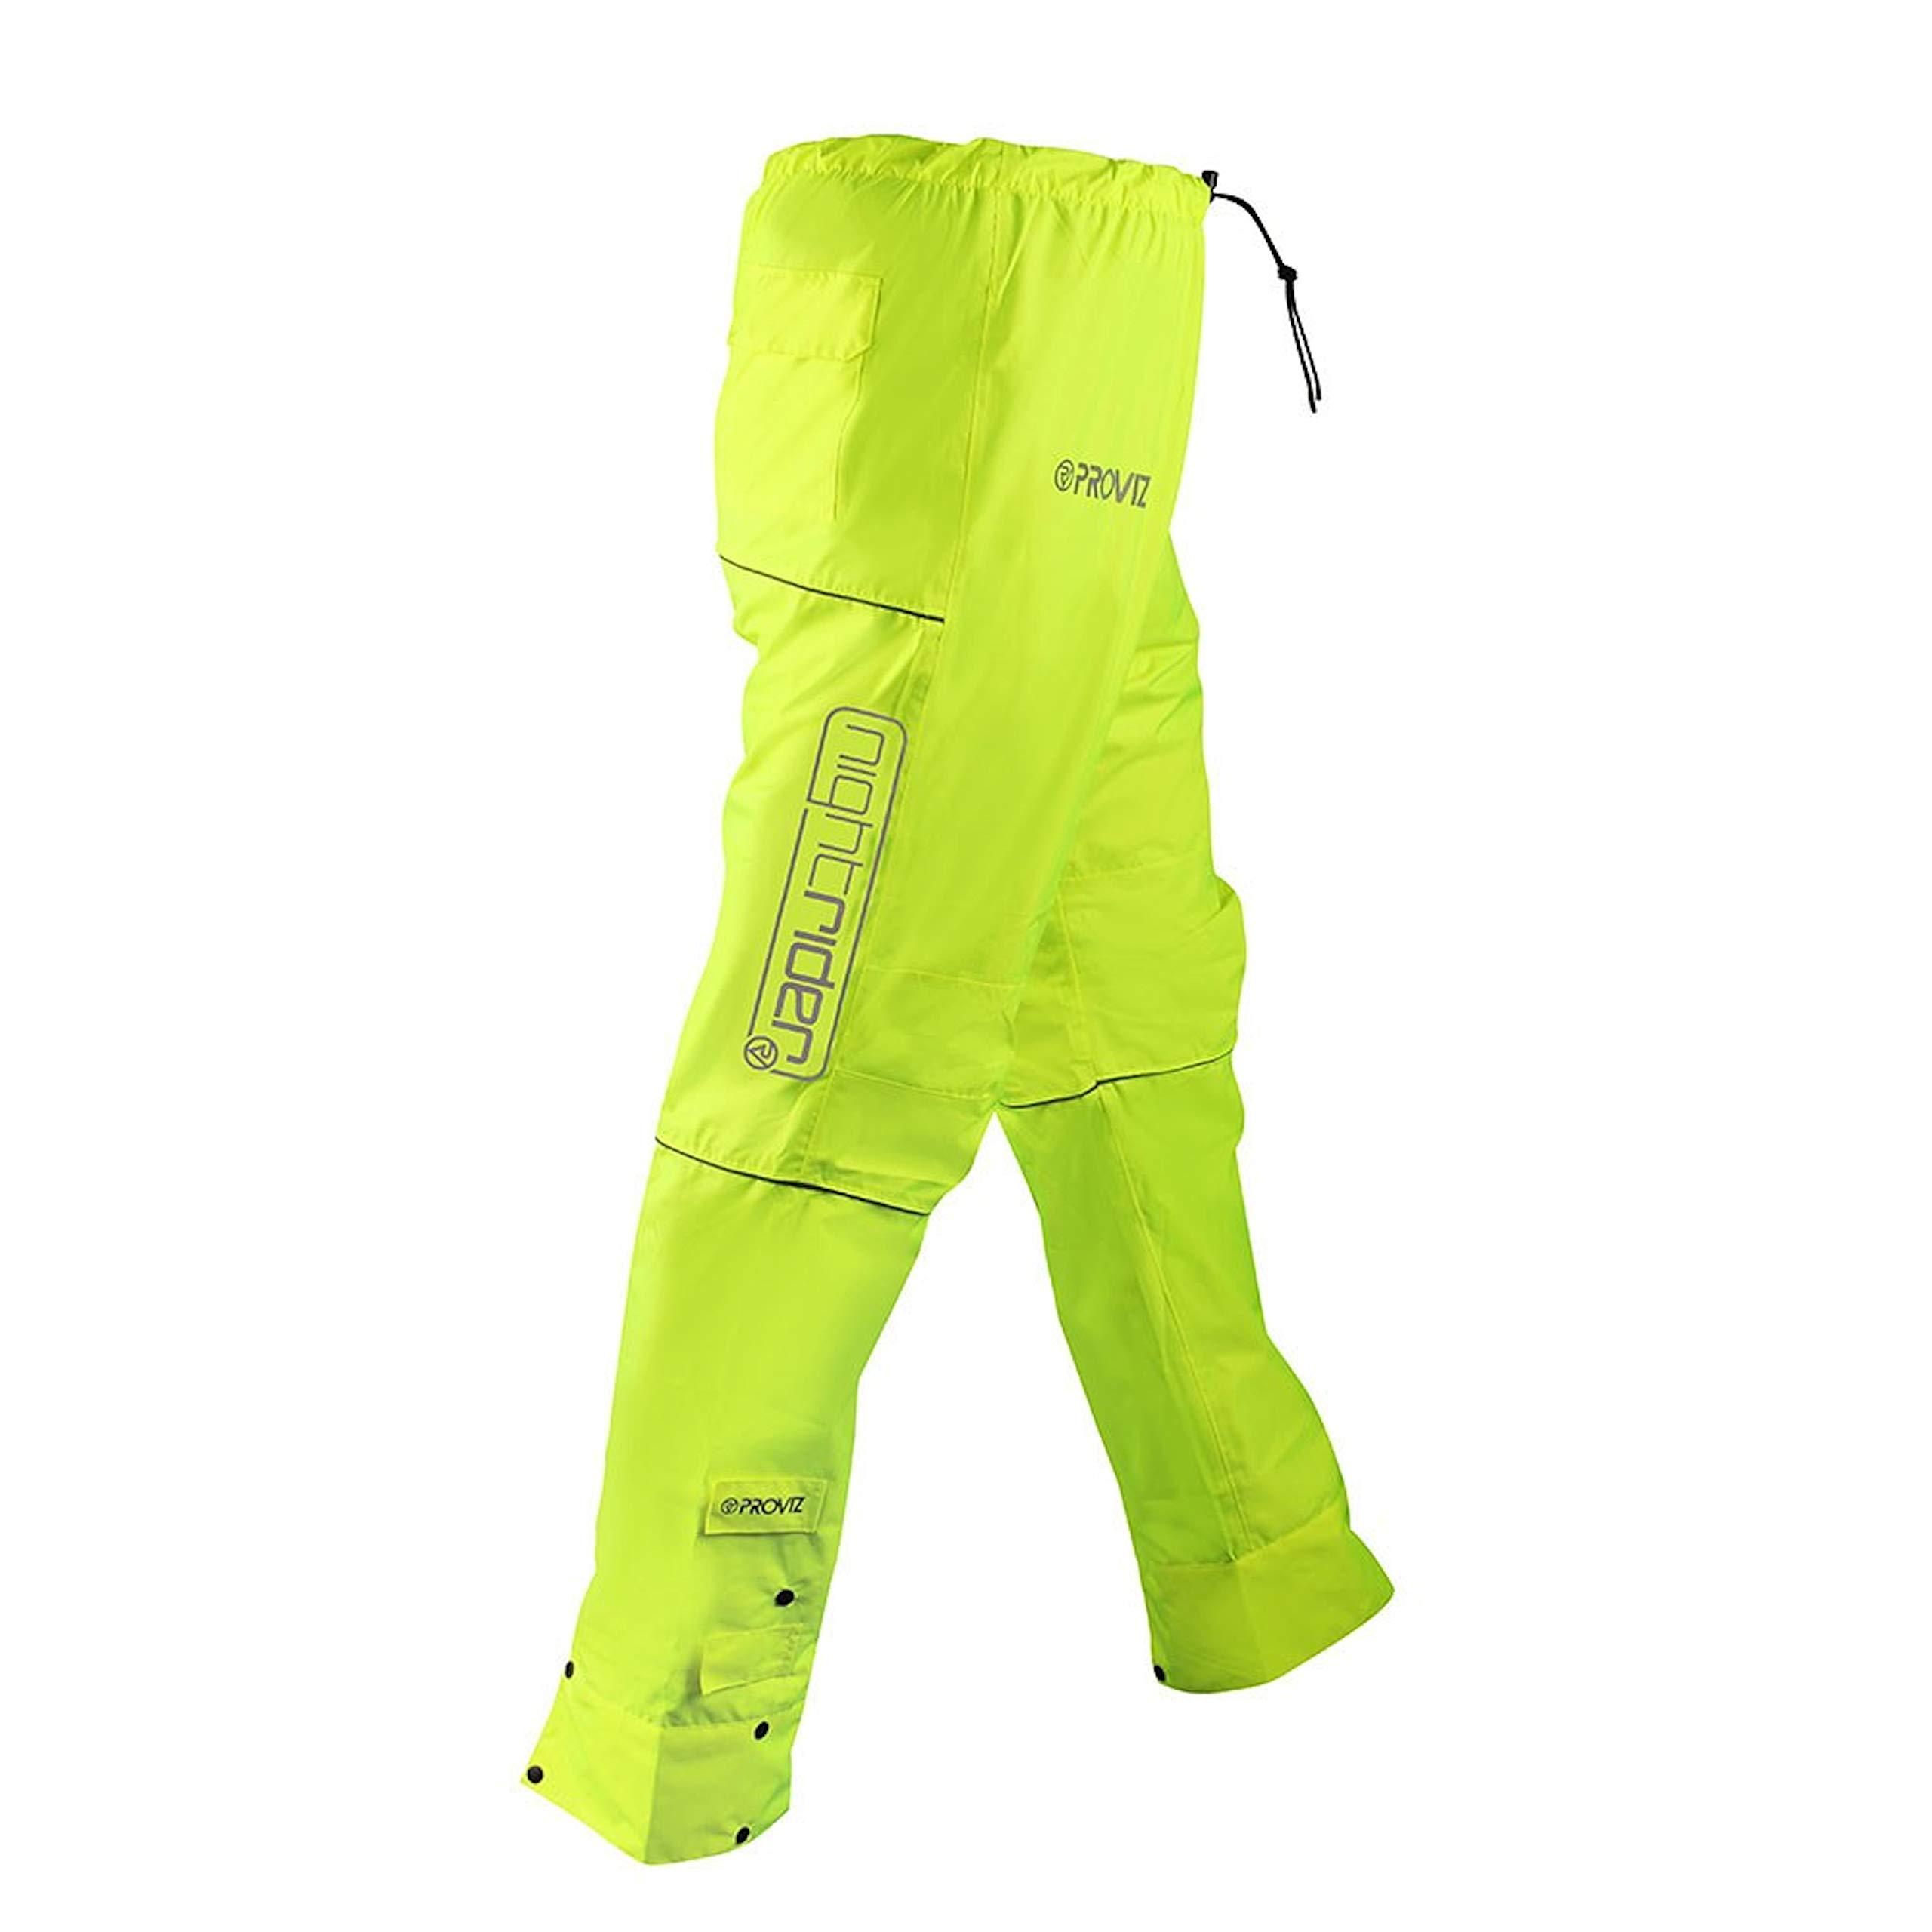 ProViz Nightrider Hose Damen gelb XL Regenhose, Gr. XL